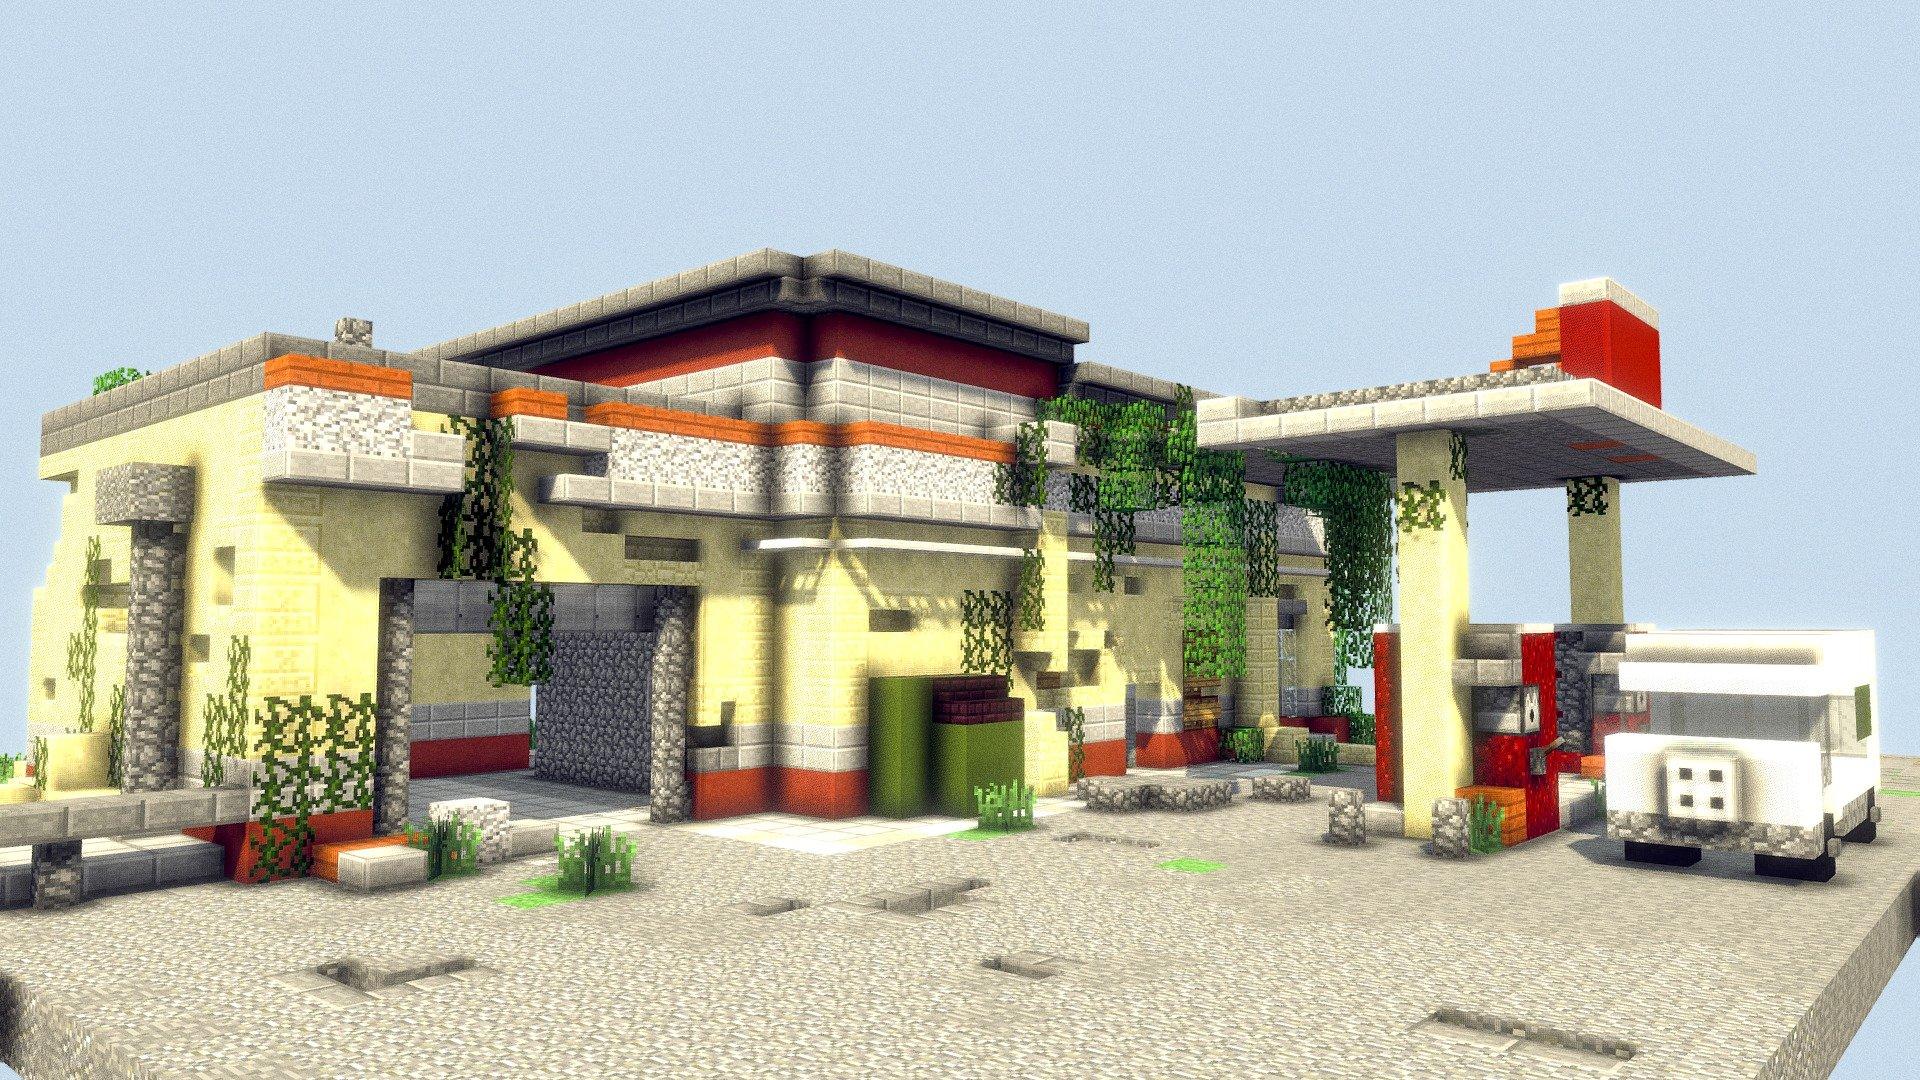 Voxel Minecraft Abandoned Gas Station 3d Model By Calibobdoodles Callumk 413fe8d Sketchfab